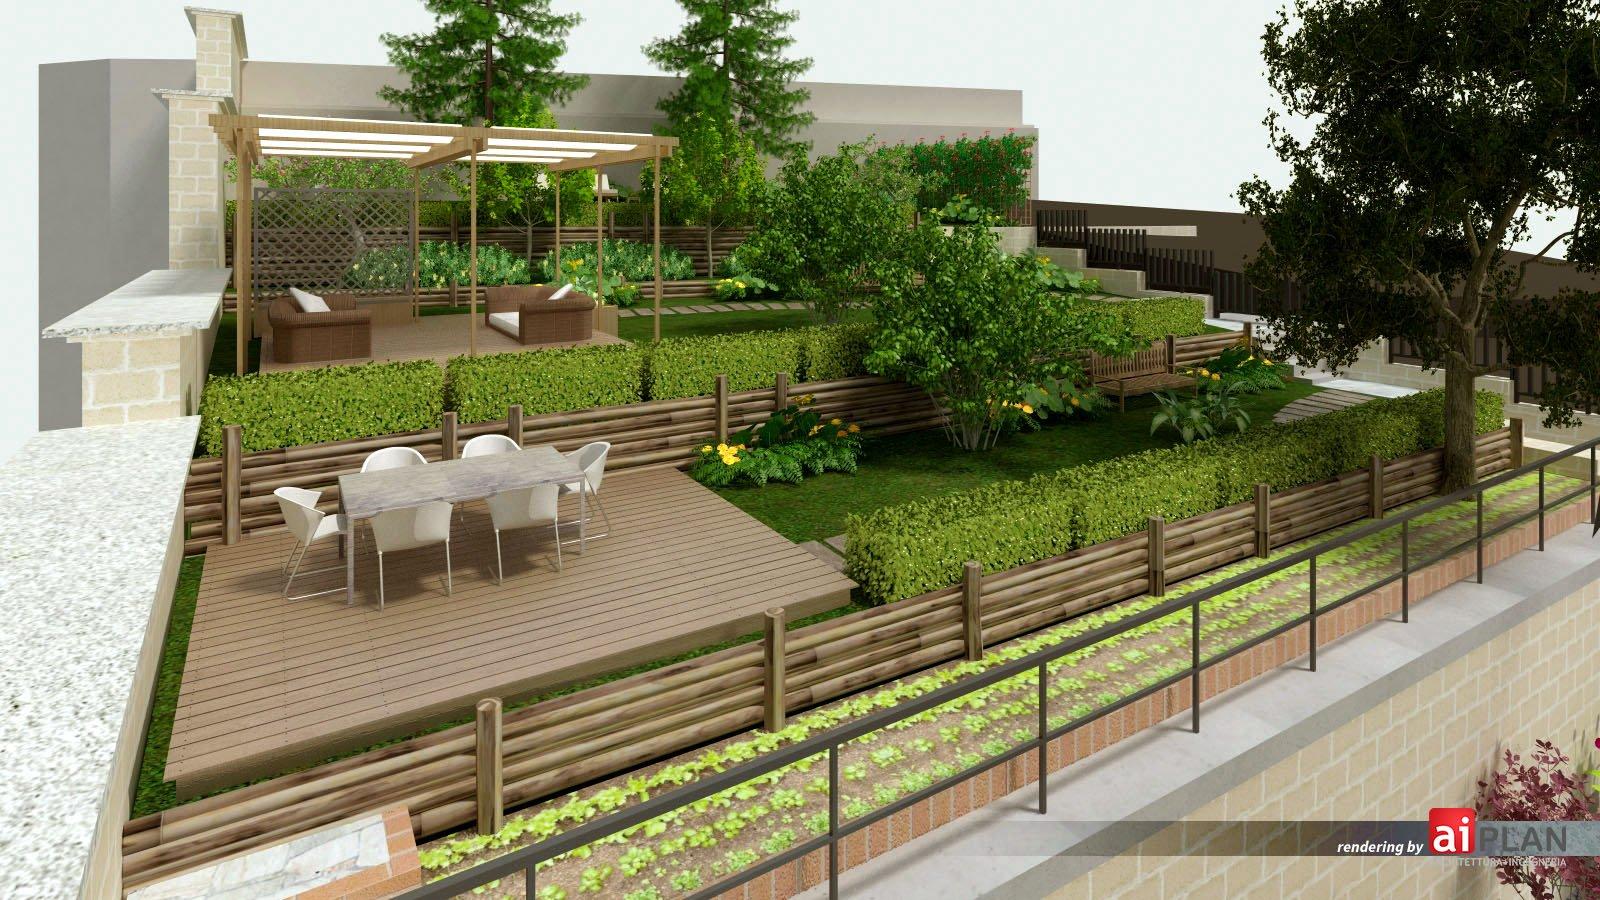 rendering di giardini parchi e sistemi di verde aiplan